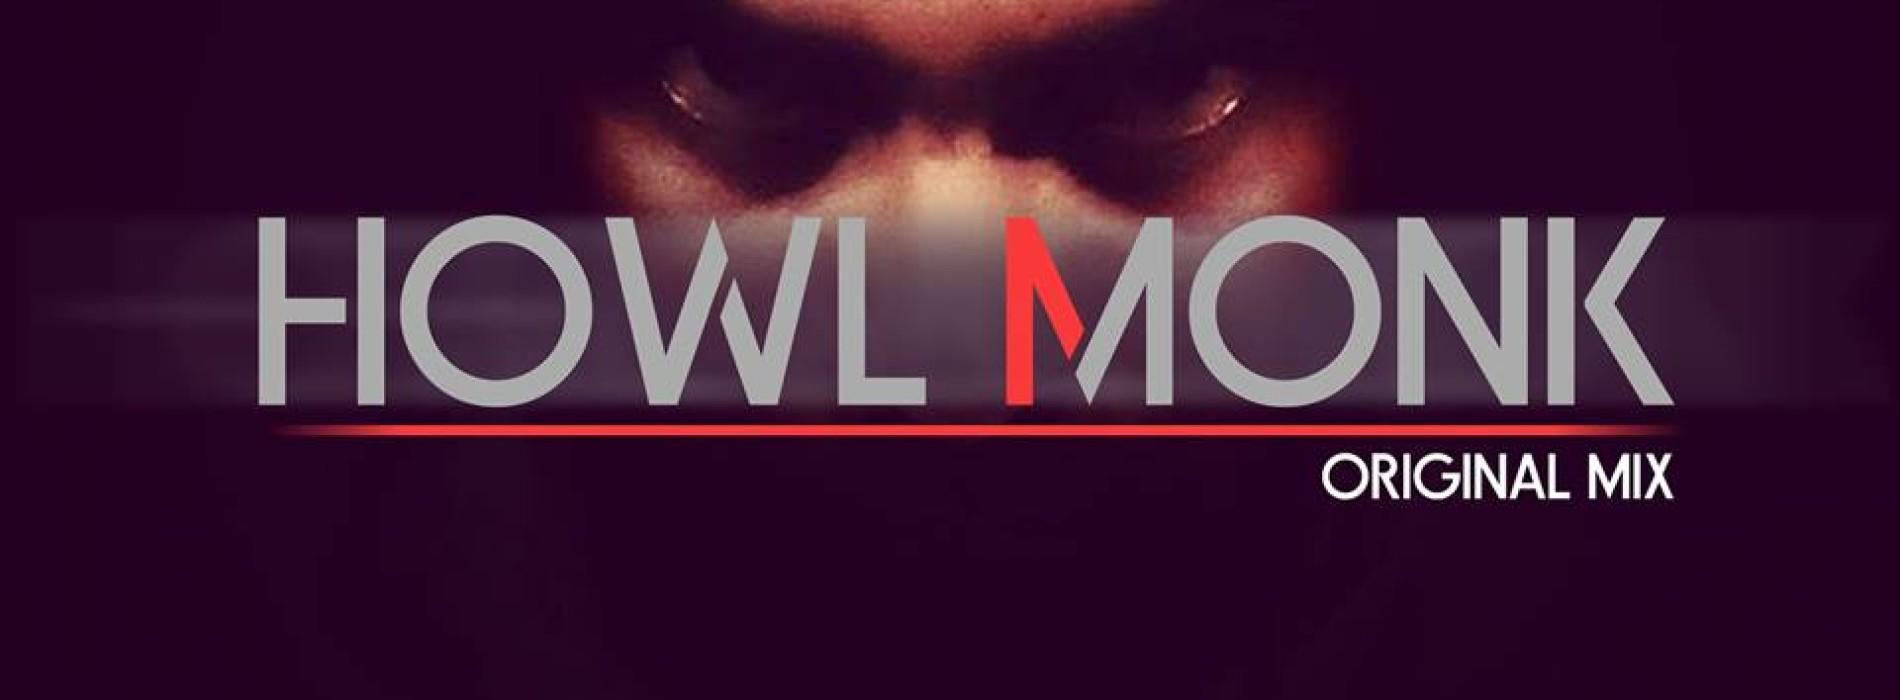 Mr. A – Howl Monk (Original Mix) DEMO